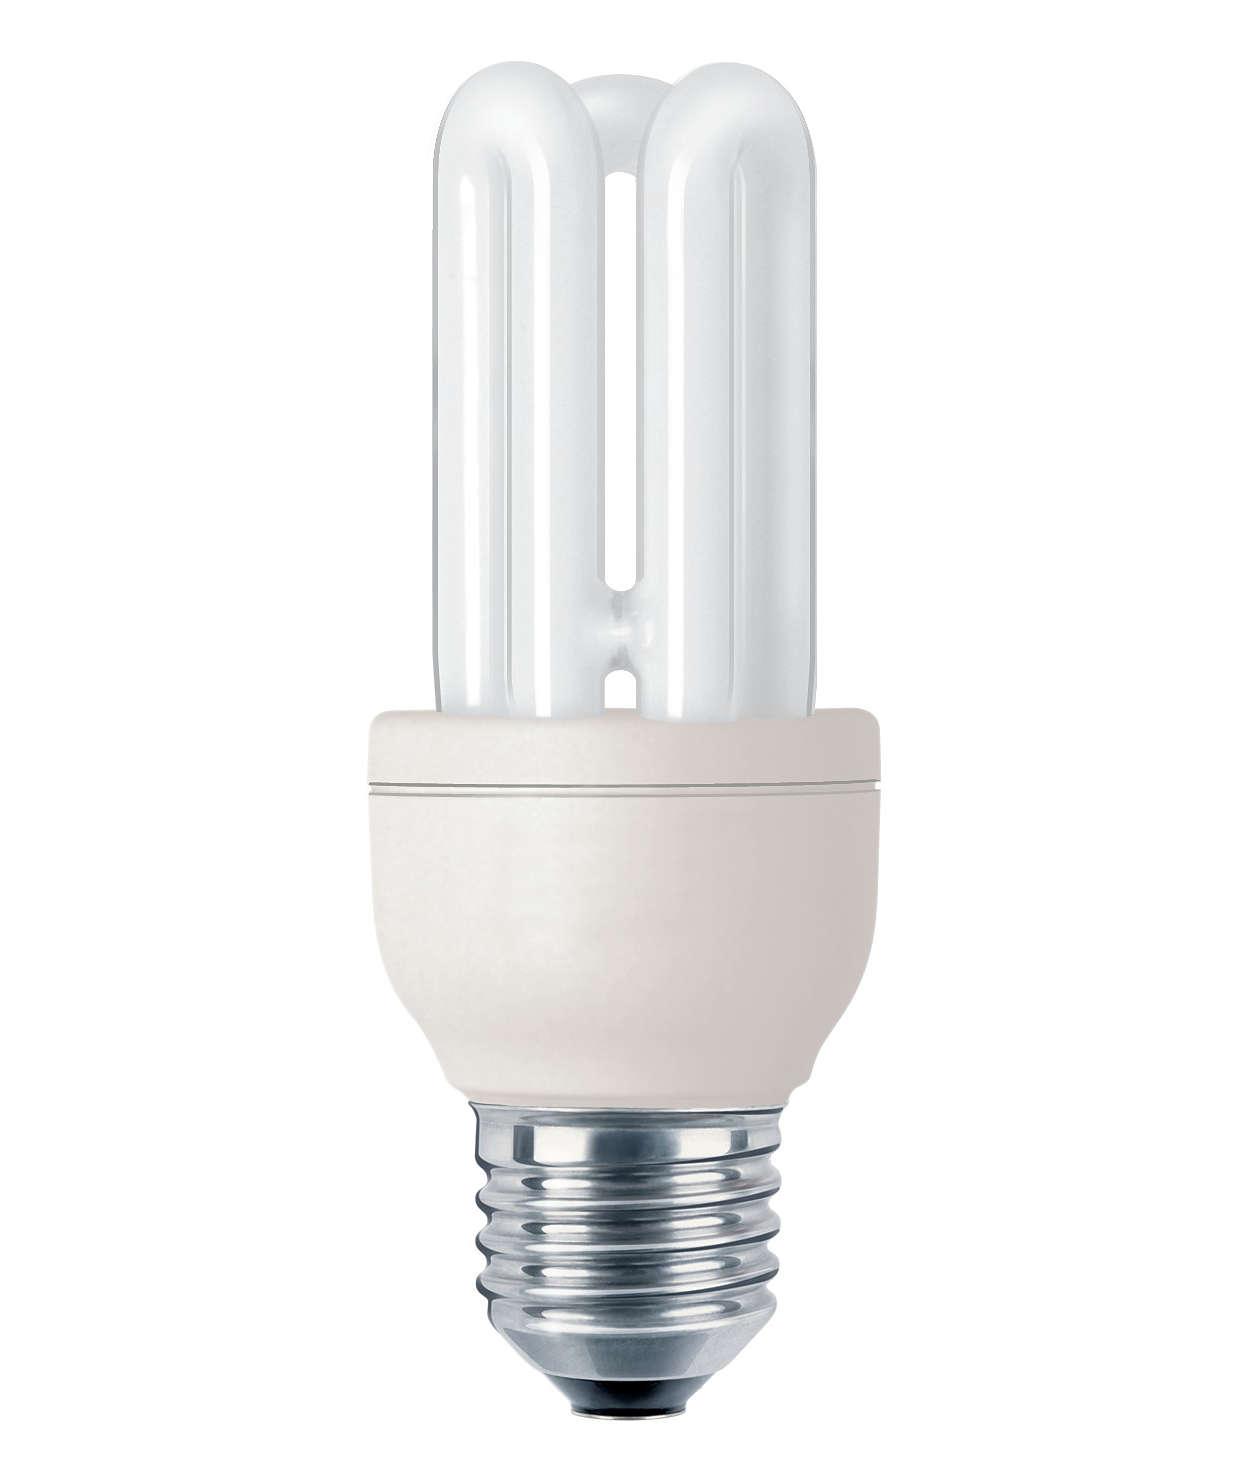 Pieni, tehokas ja kaunis lamppu